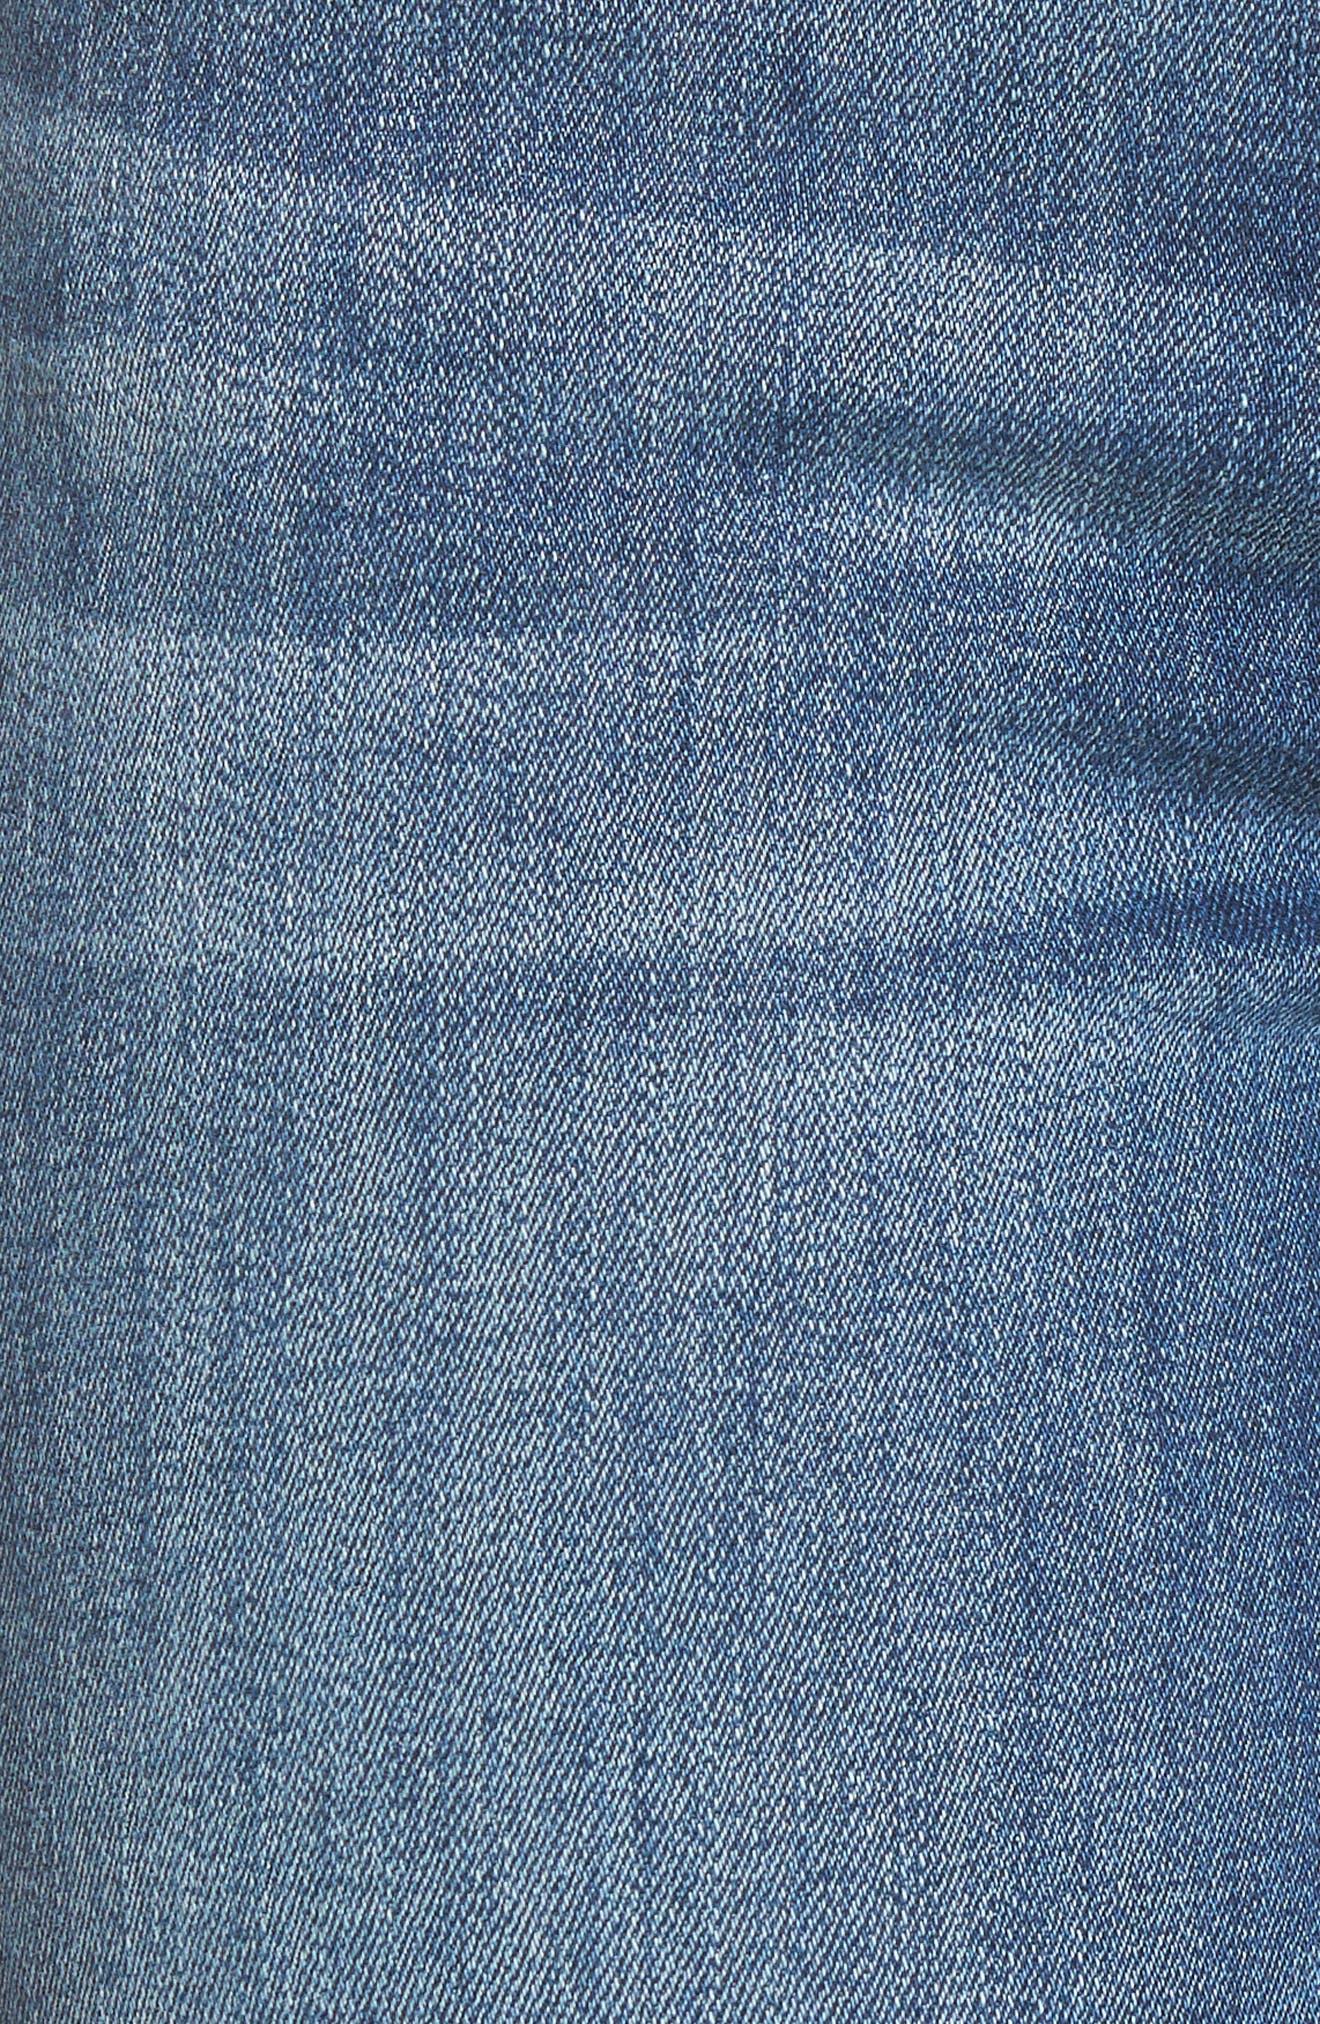 Mara Straight Leg Jeans,                             Alternate thumbnail 6, color,                             Spring Lake